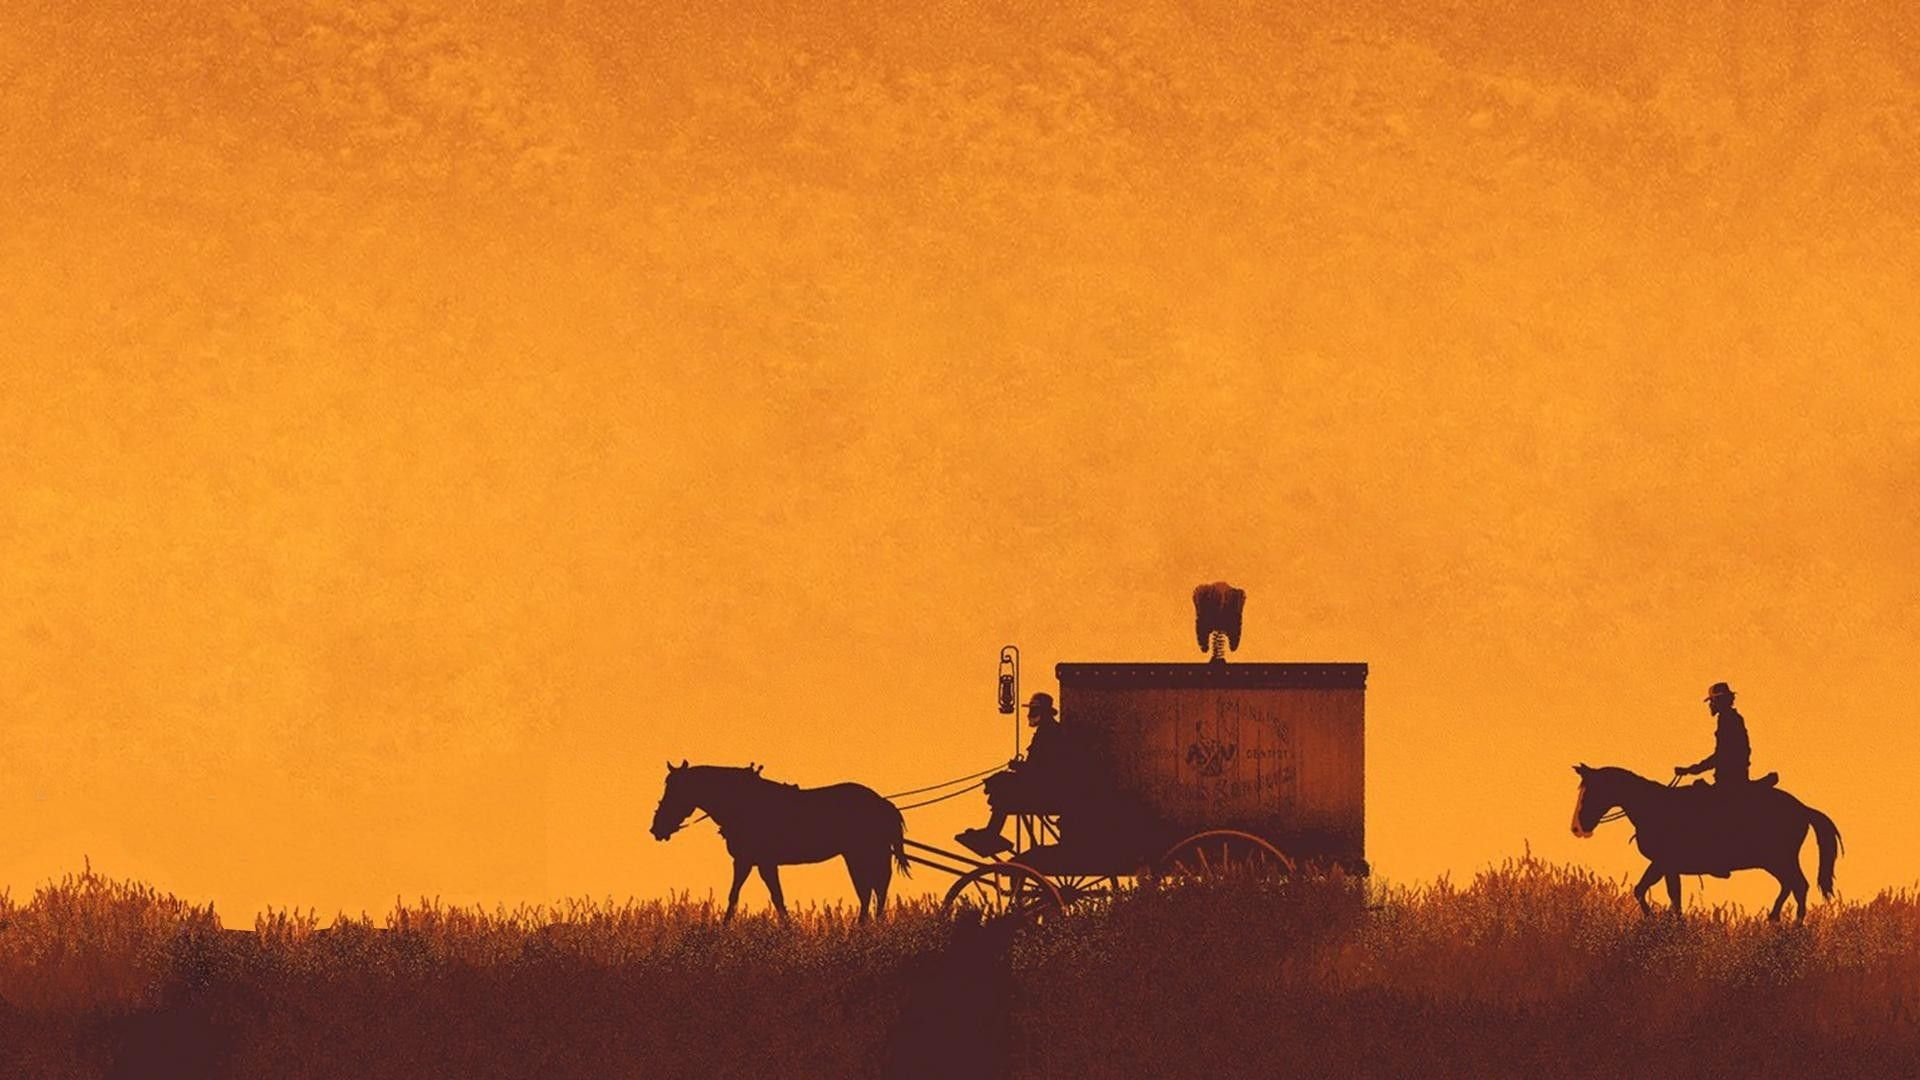 Background image django - Django Unchained Artwork Wallpaper 57173